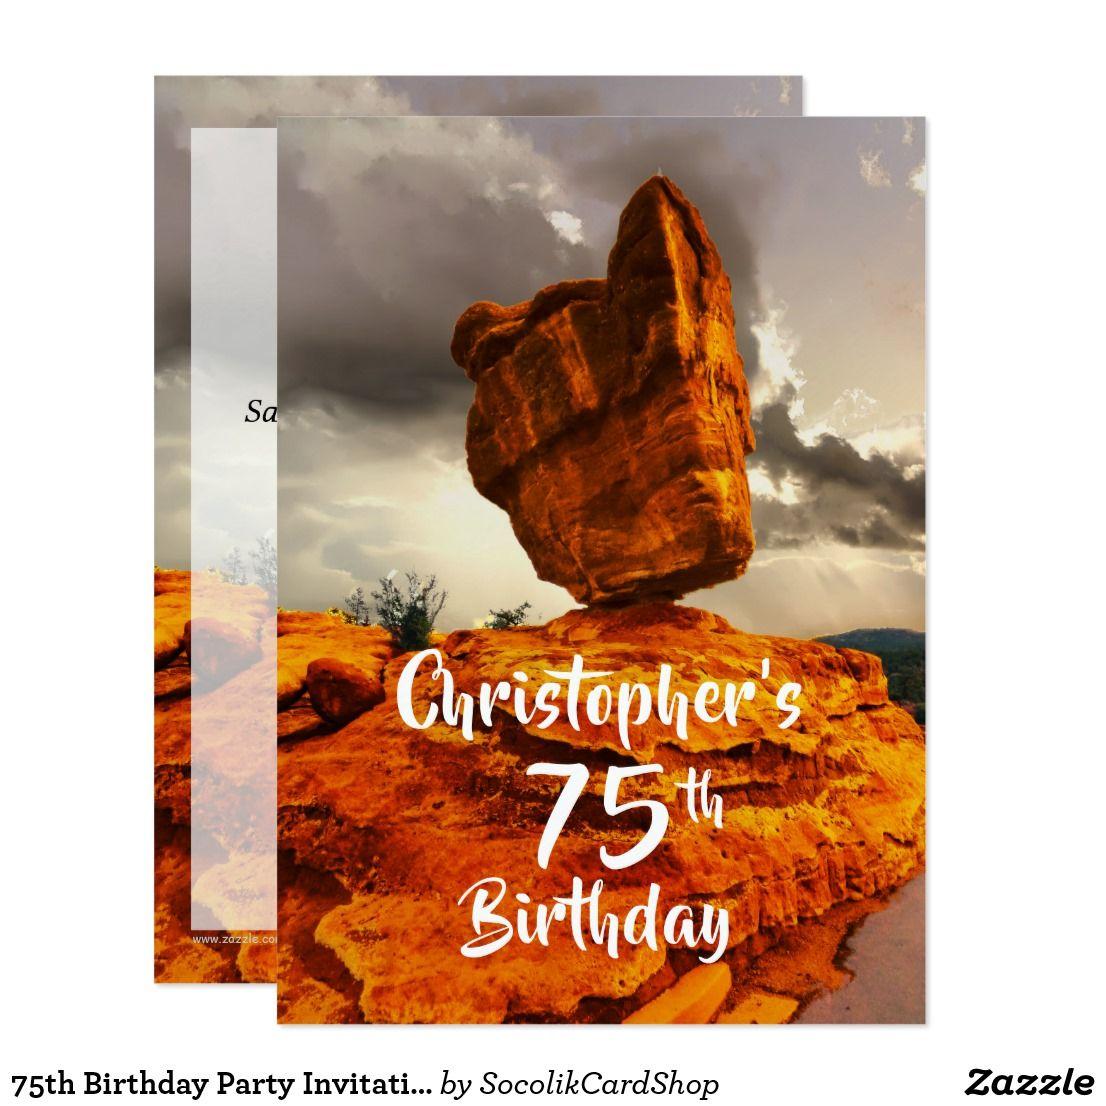 75th Birthday Party Invitation Balanced Rock Card 75th Birthday